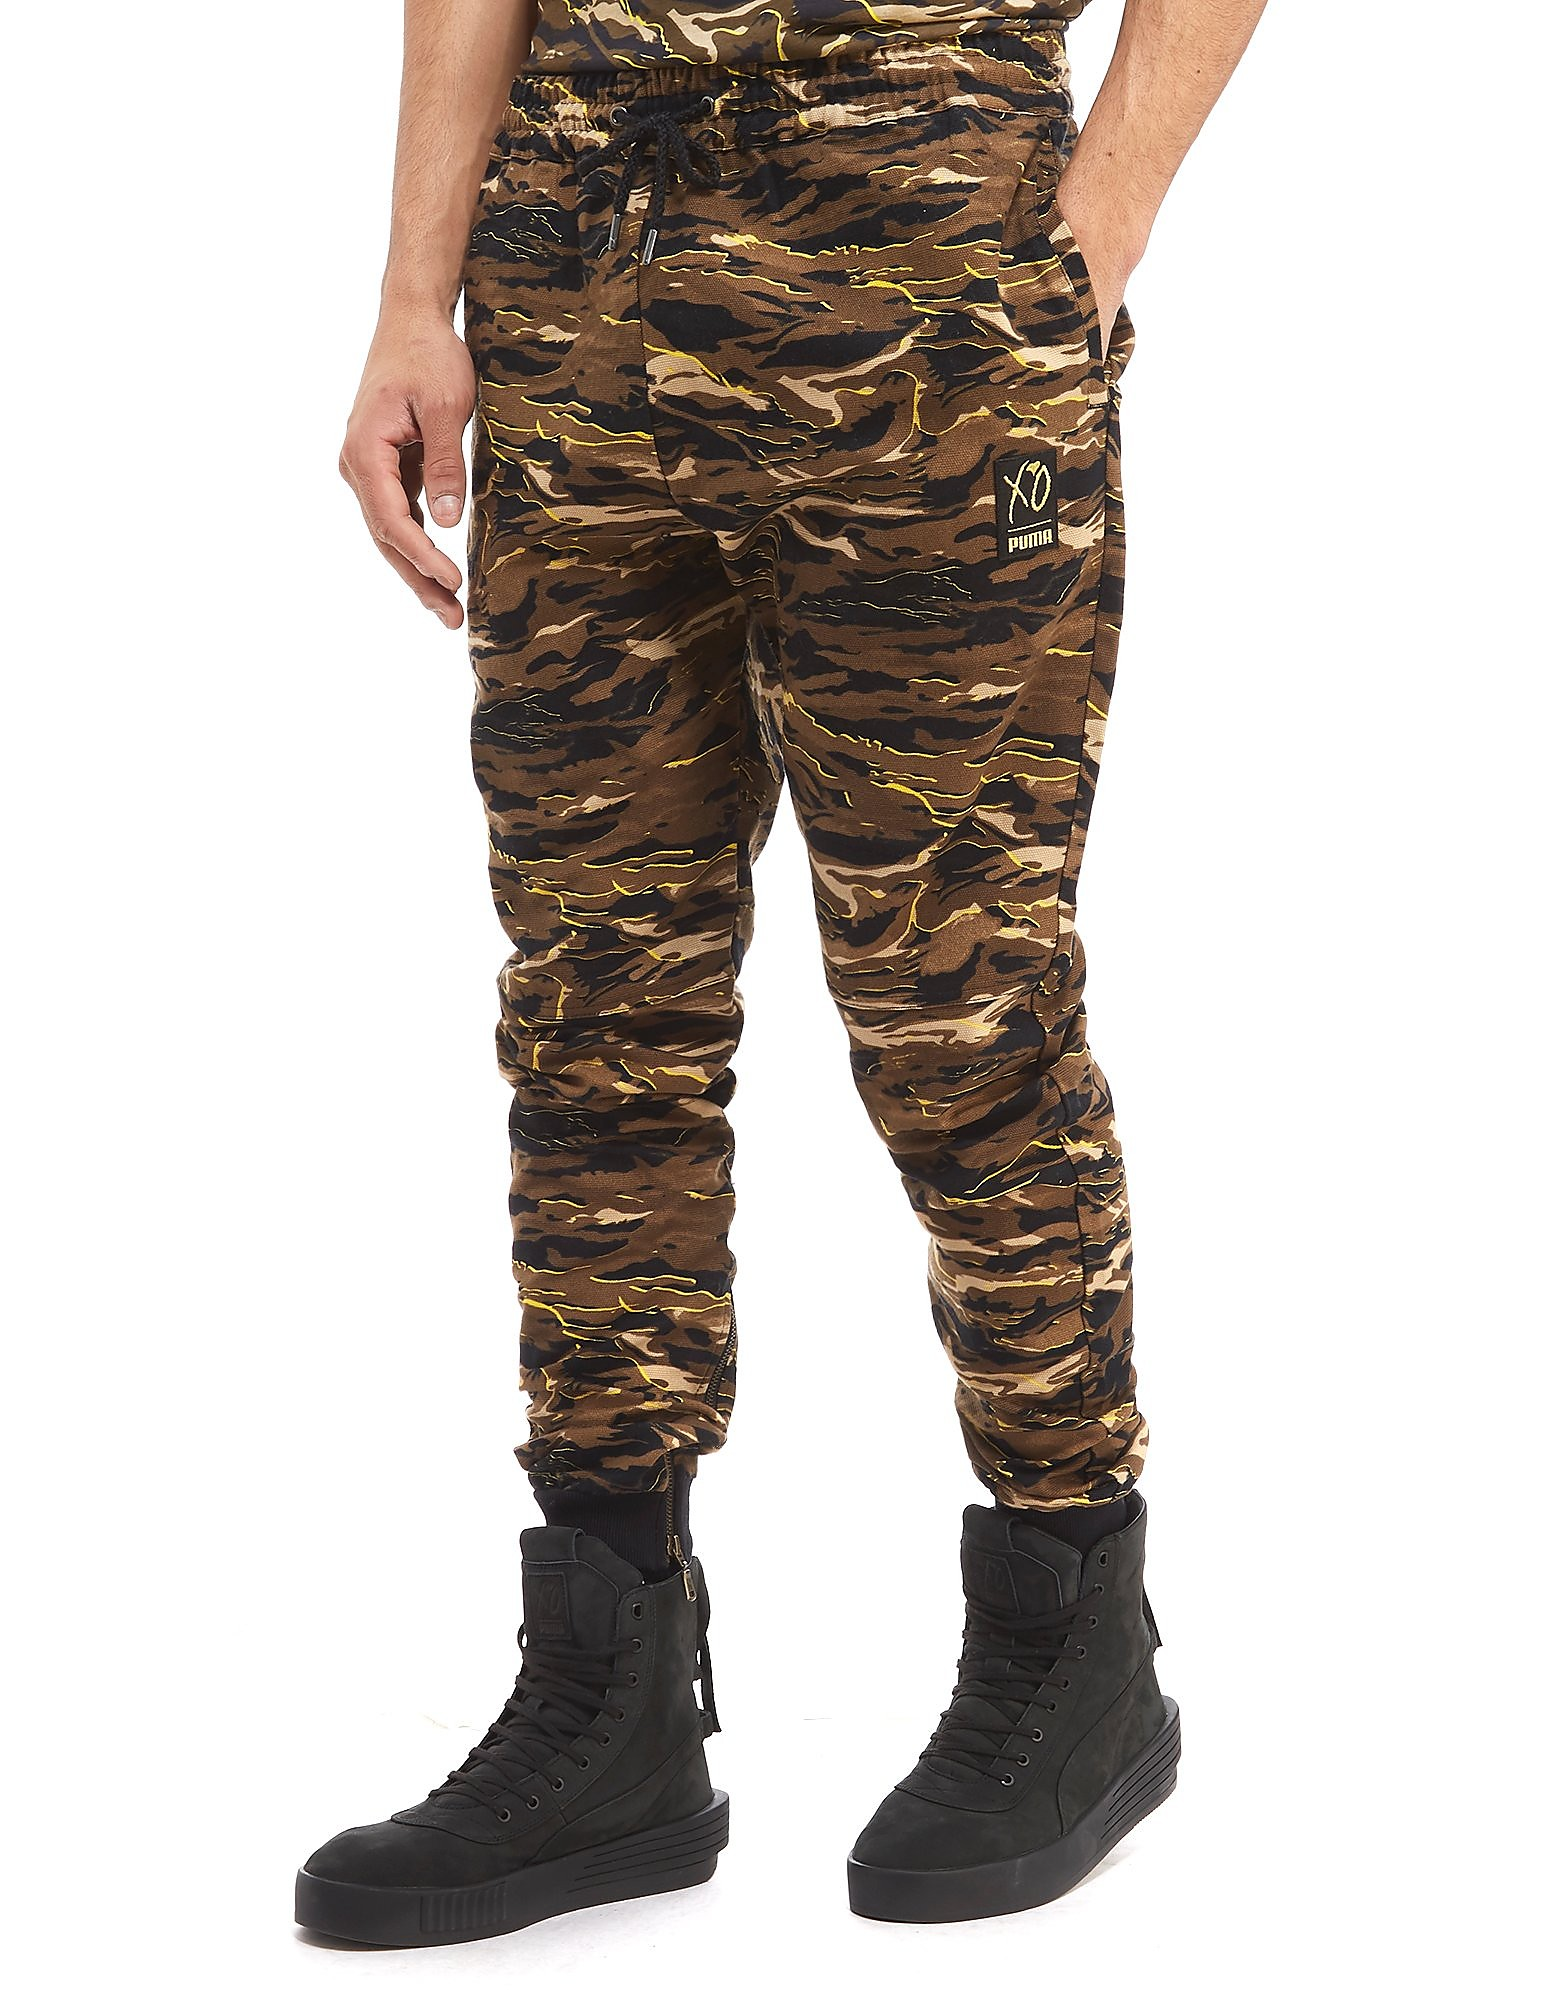 PUMA XO All-Over-Print Pants